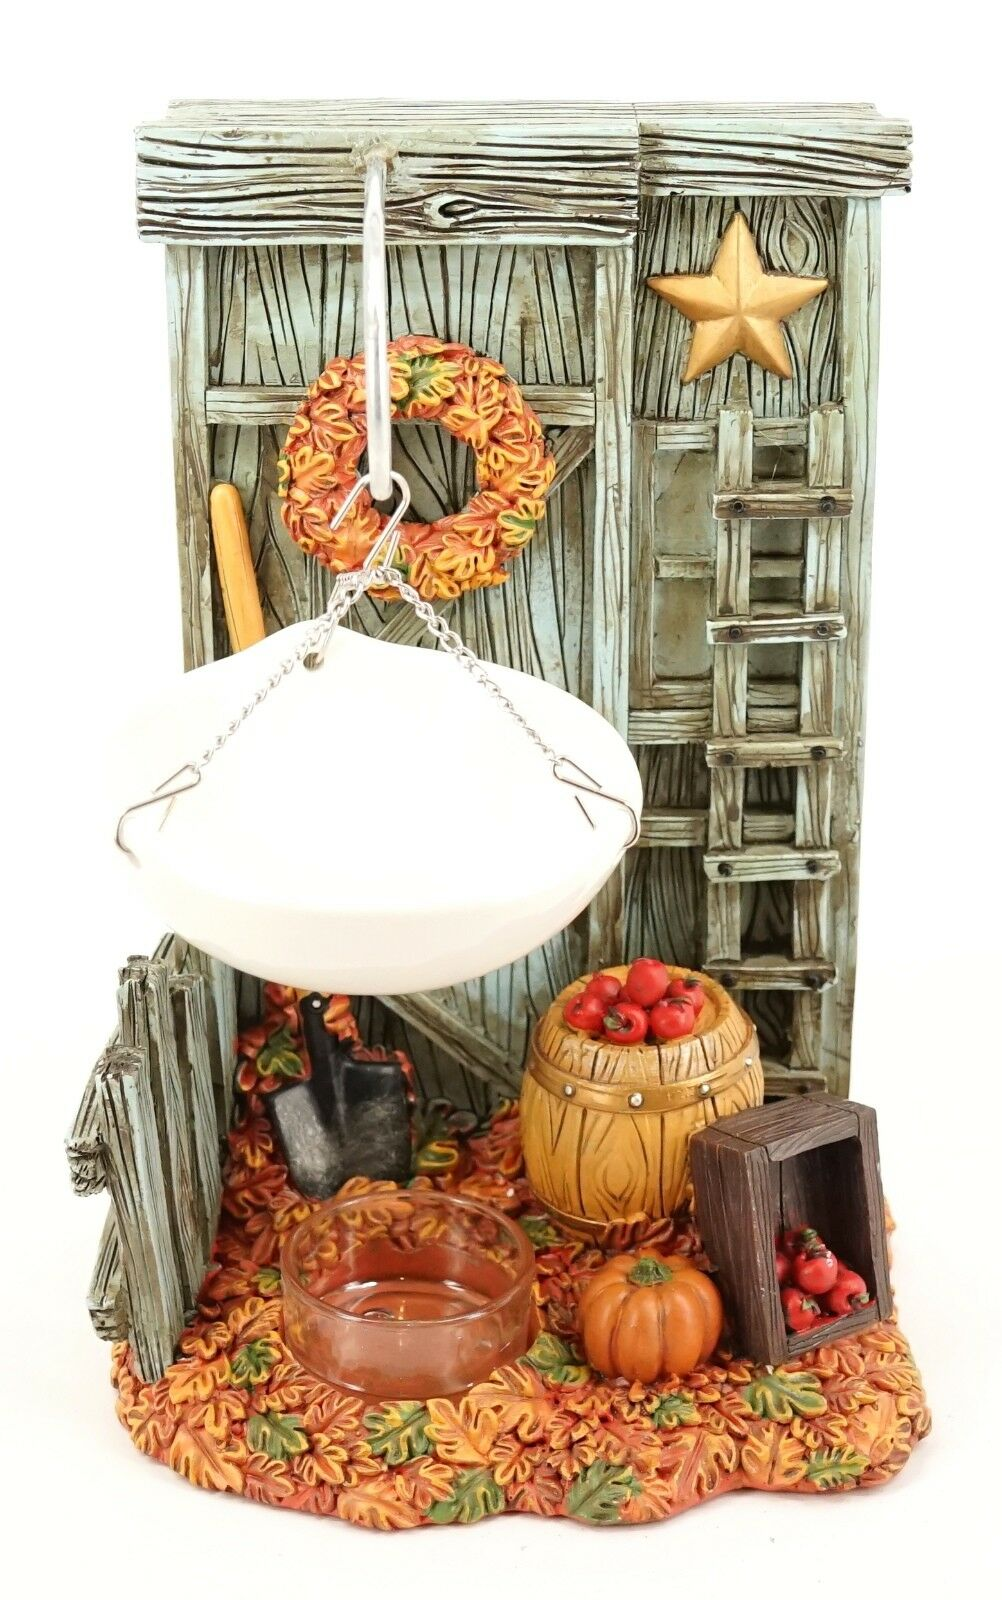 NEW Yankee Candle Hang Fall Barn Hanging Tart Warmer Burner